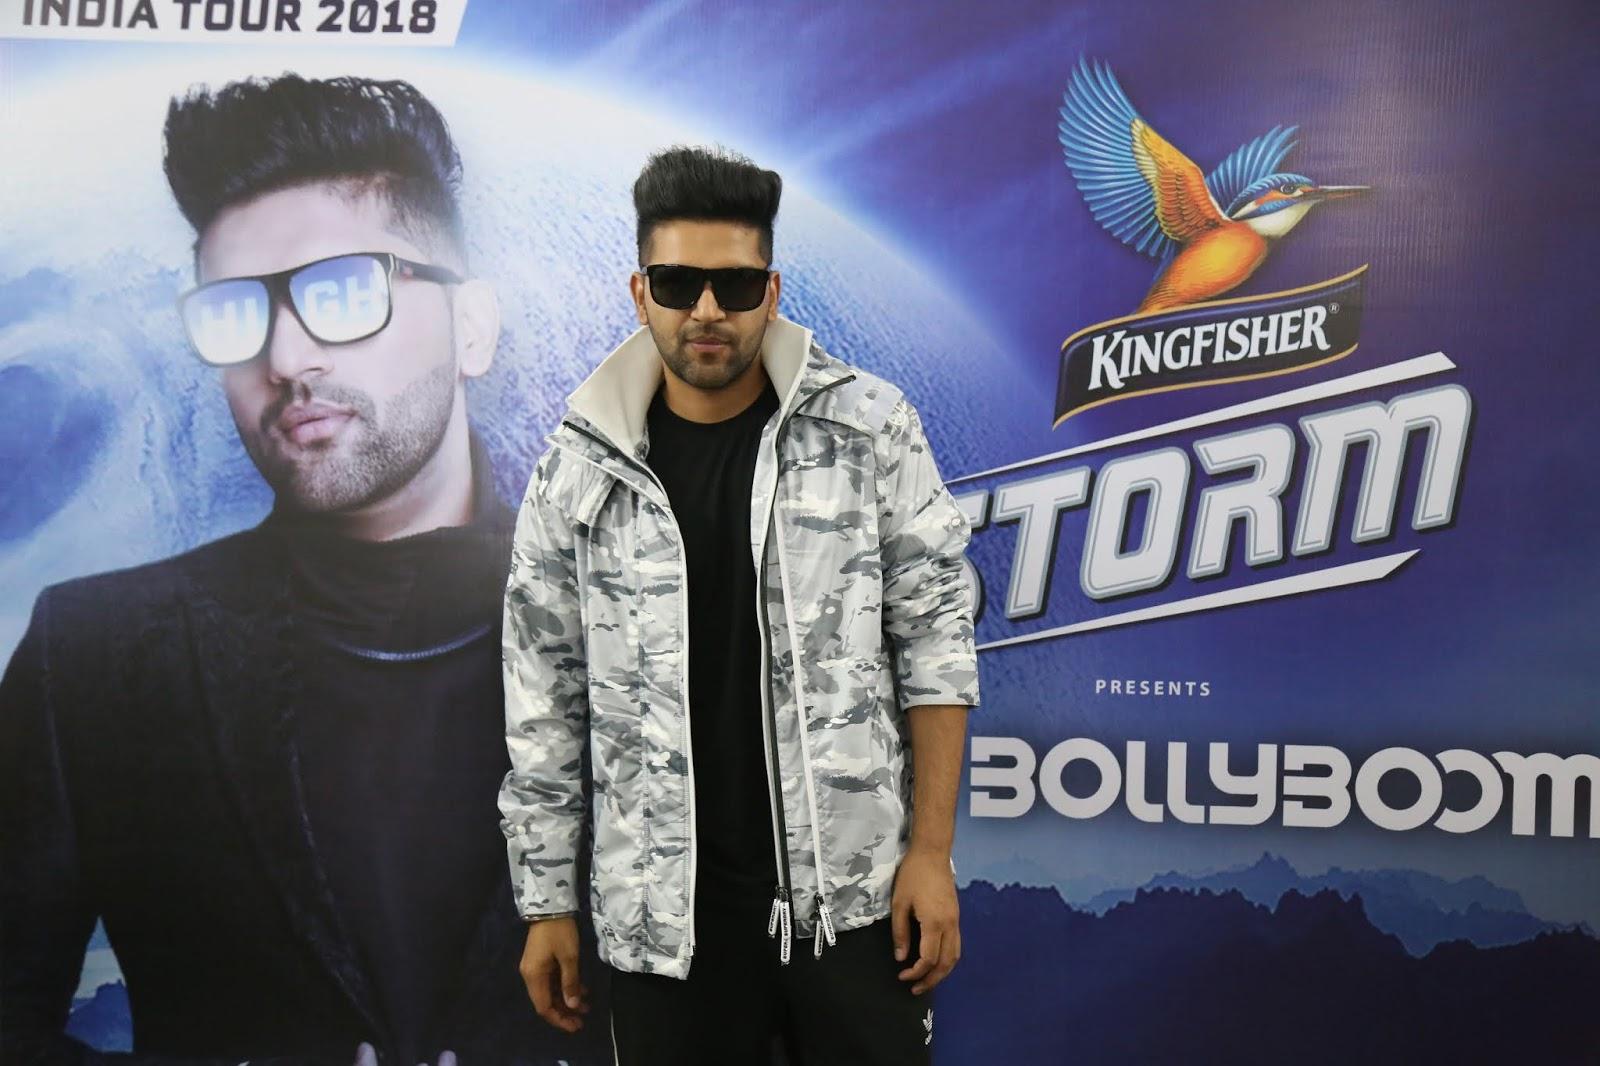 Kingfisher Storm Bollyboom brings Swag Star Guru Randhawa to